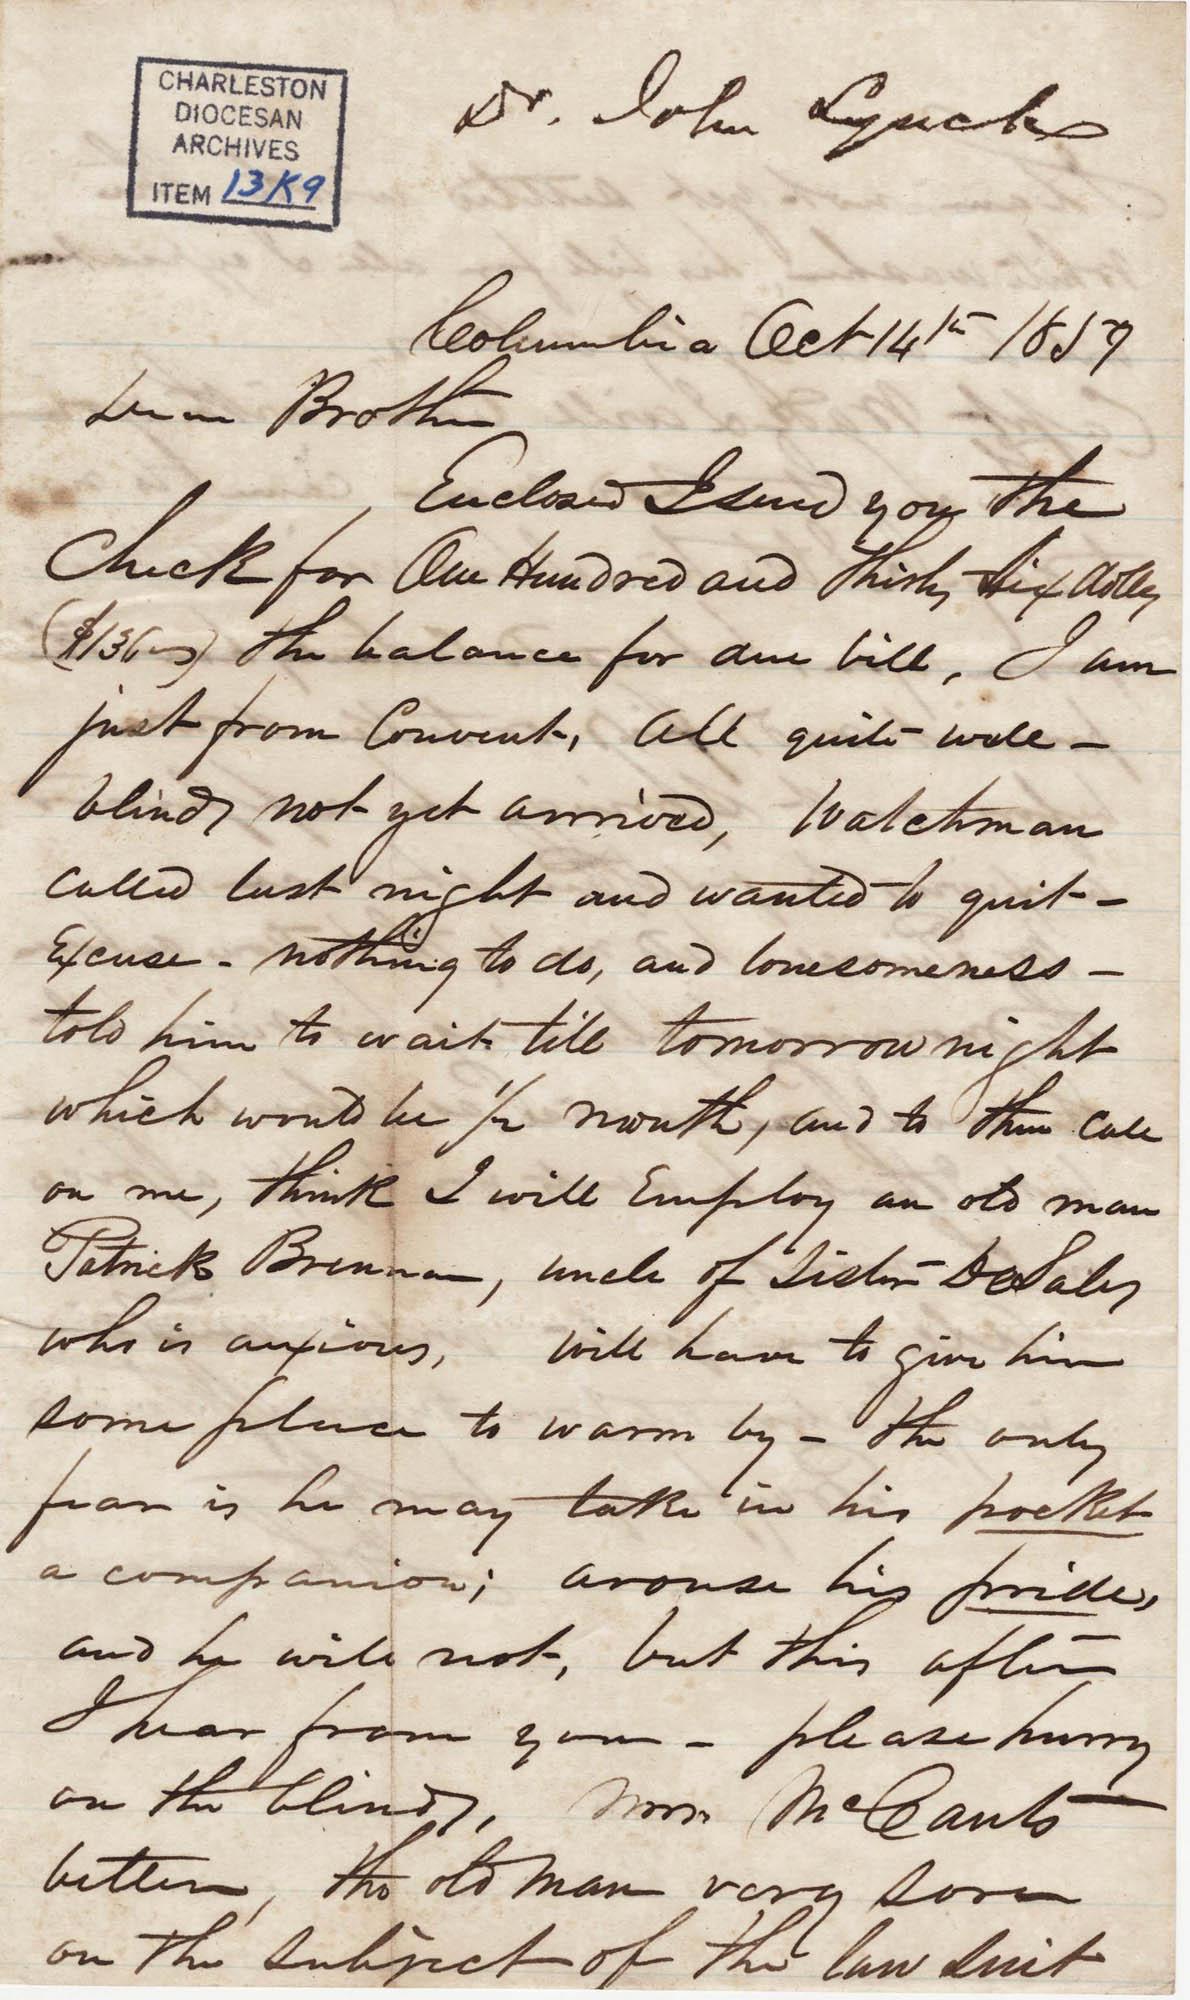 080. John Lynch to Bp Patrick Lynch -- October 14, 1859